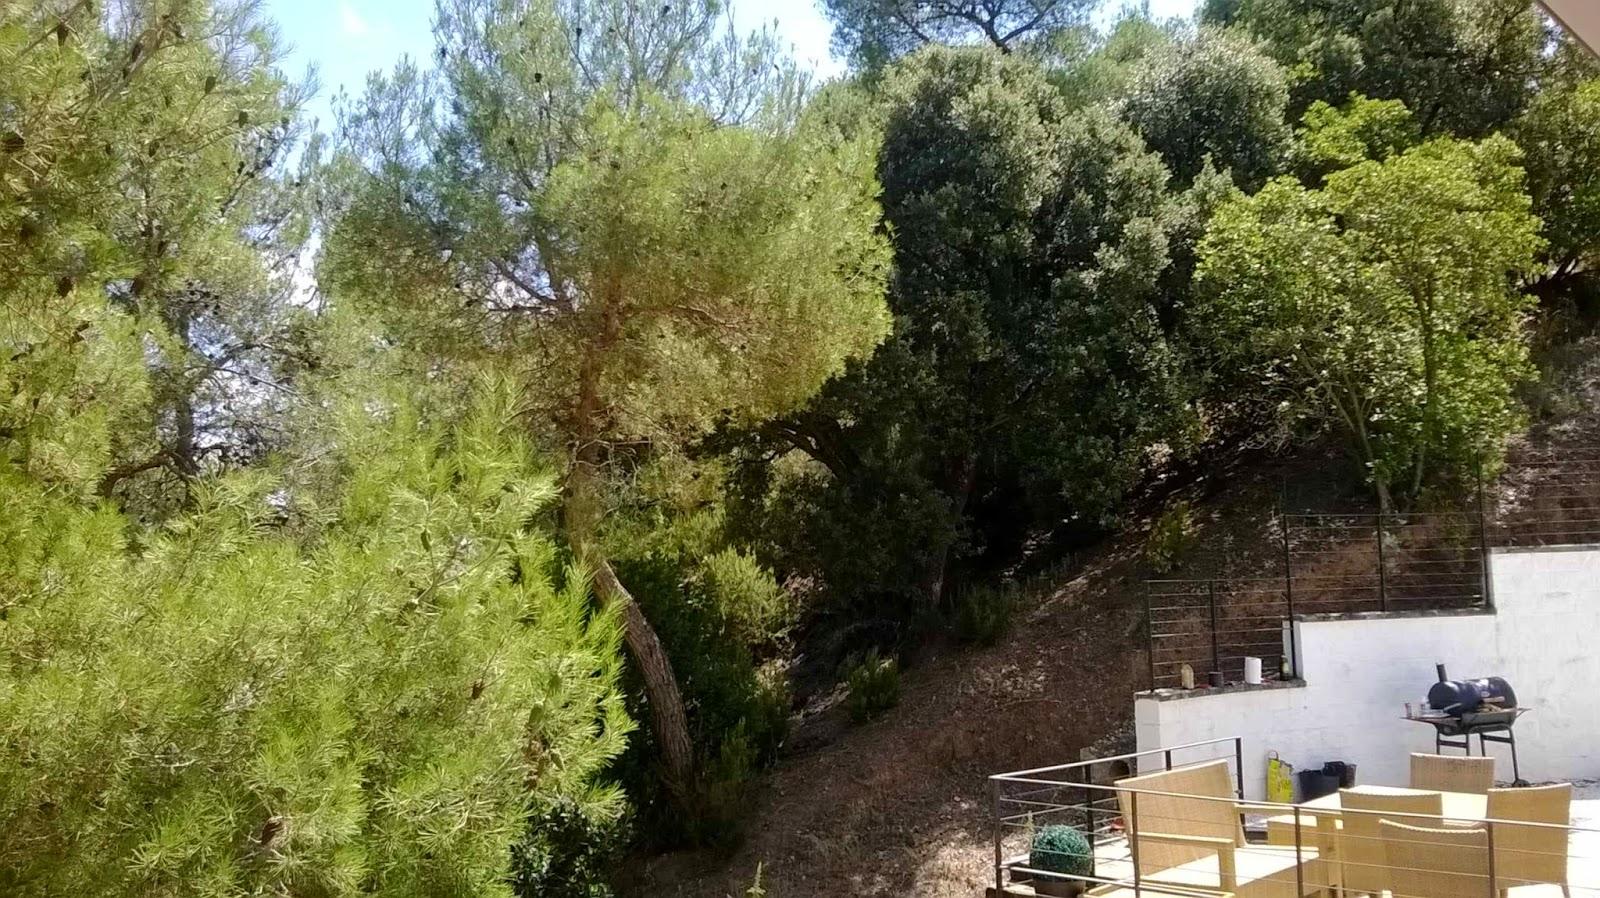 Serviciosdejardineriabasica jardineria barata solicitud for Jardineria barata barcelona